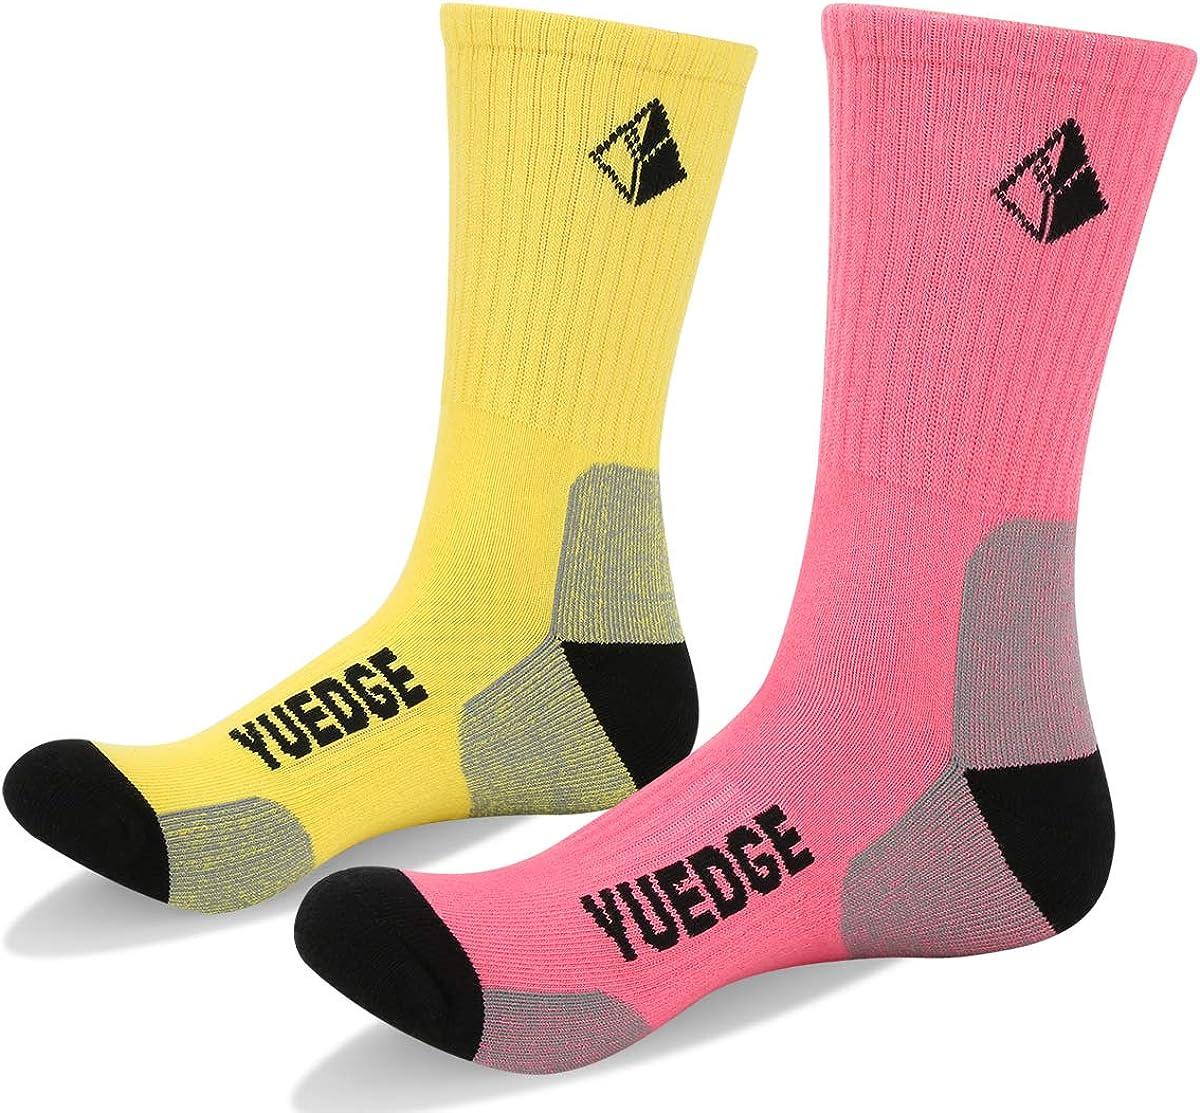 YUEDGE 5 Pairs Womens Multi Performance Cotton Cushion Crew Sports Outdoor Athletic Walking Hiking Socks